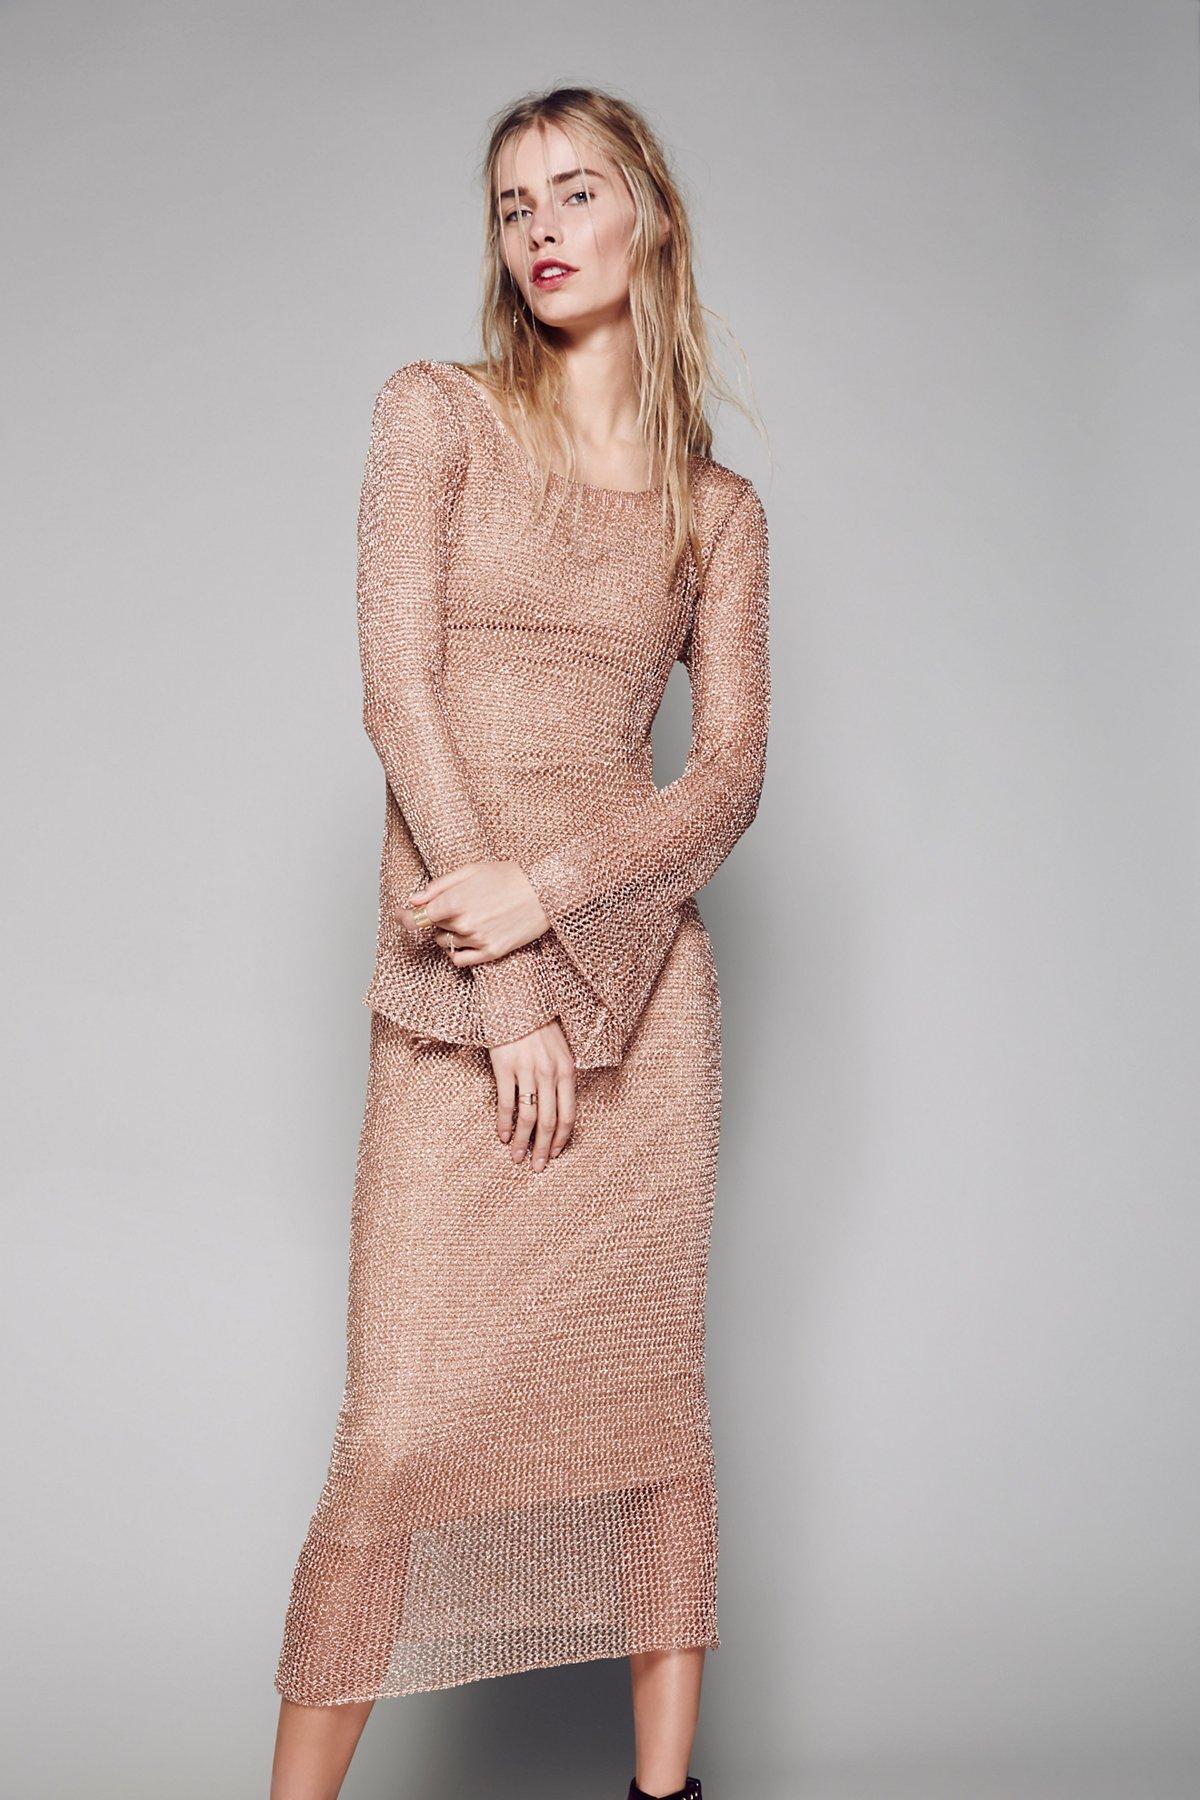 Deliah Metallic Dress